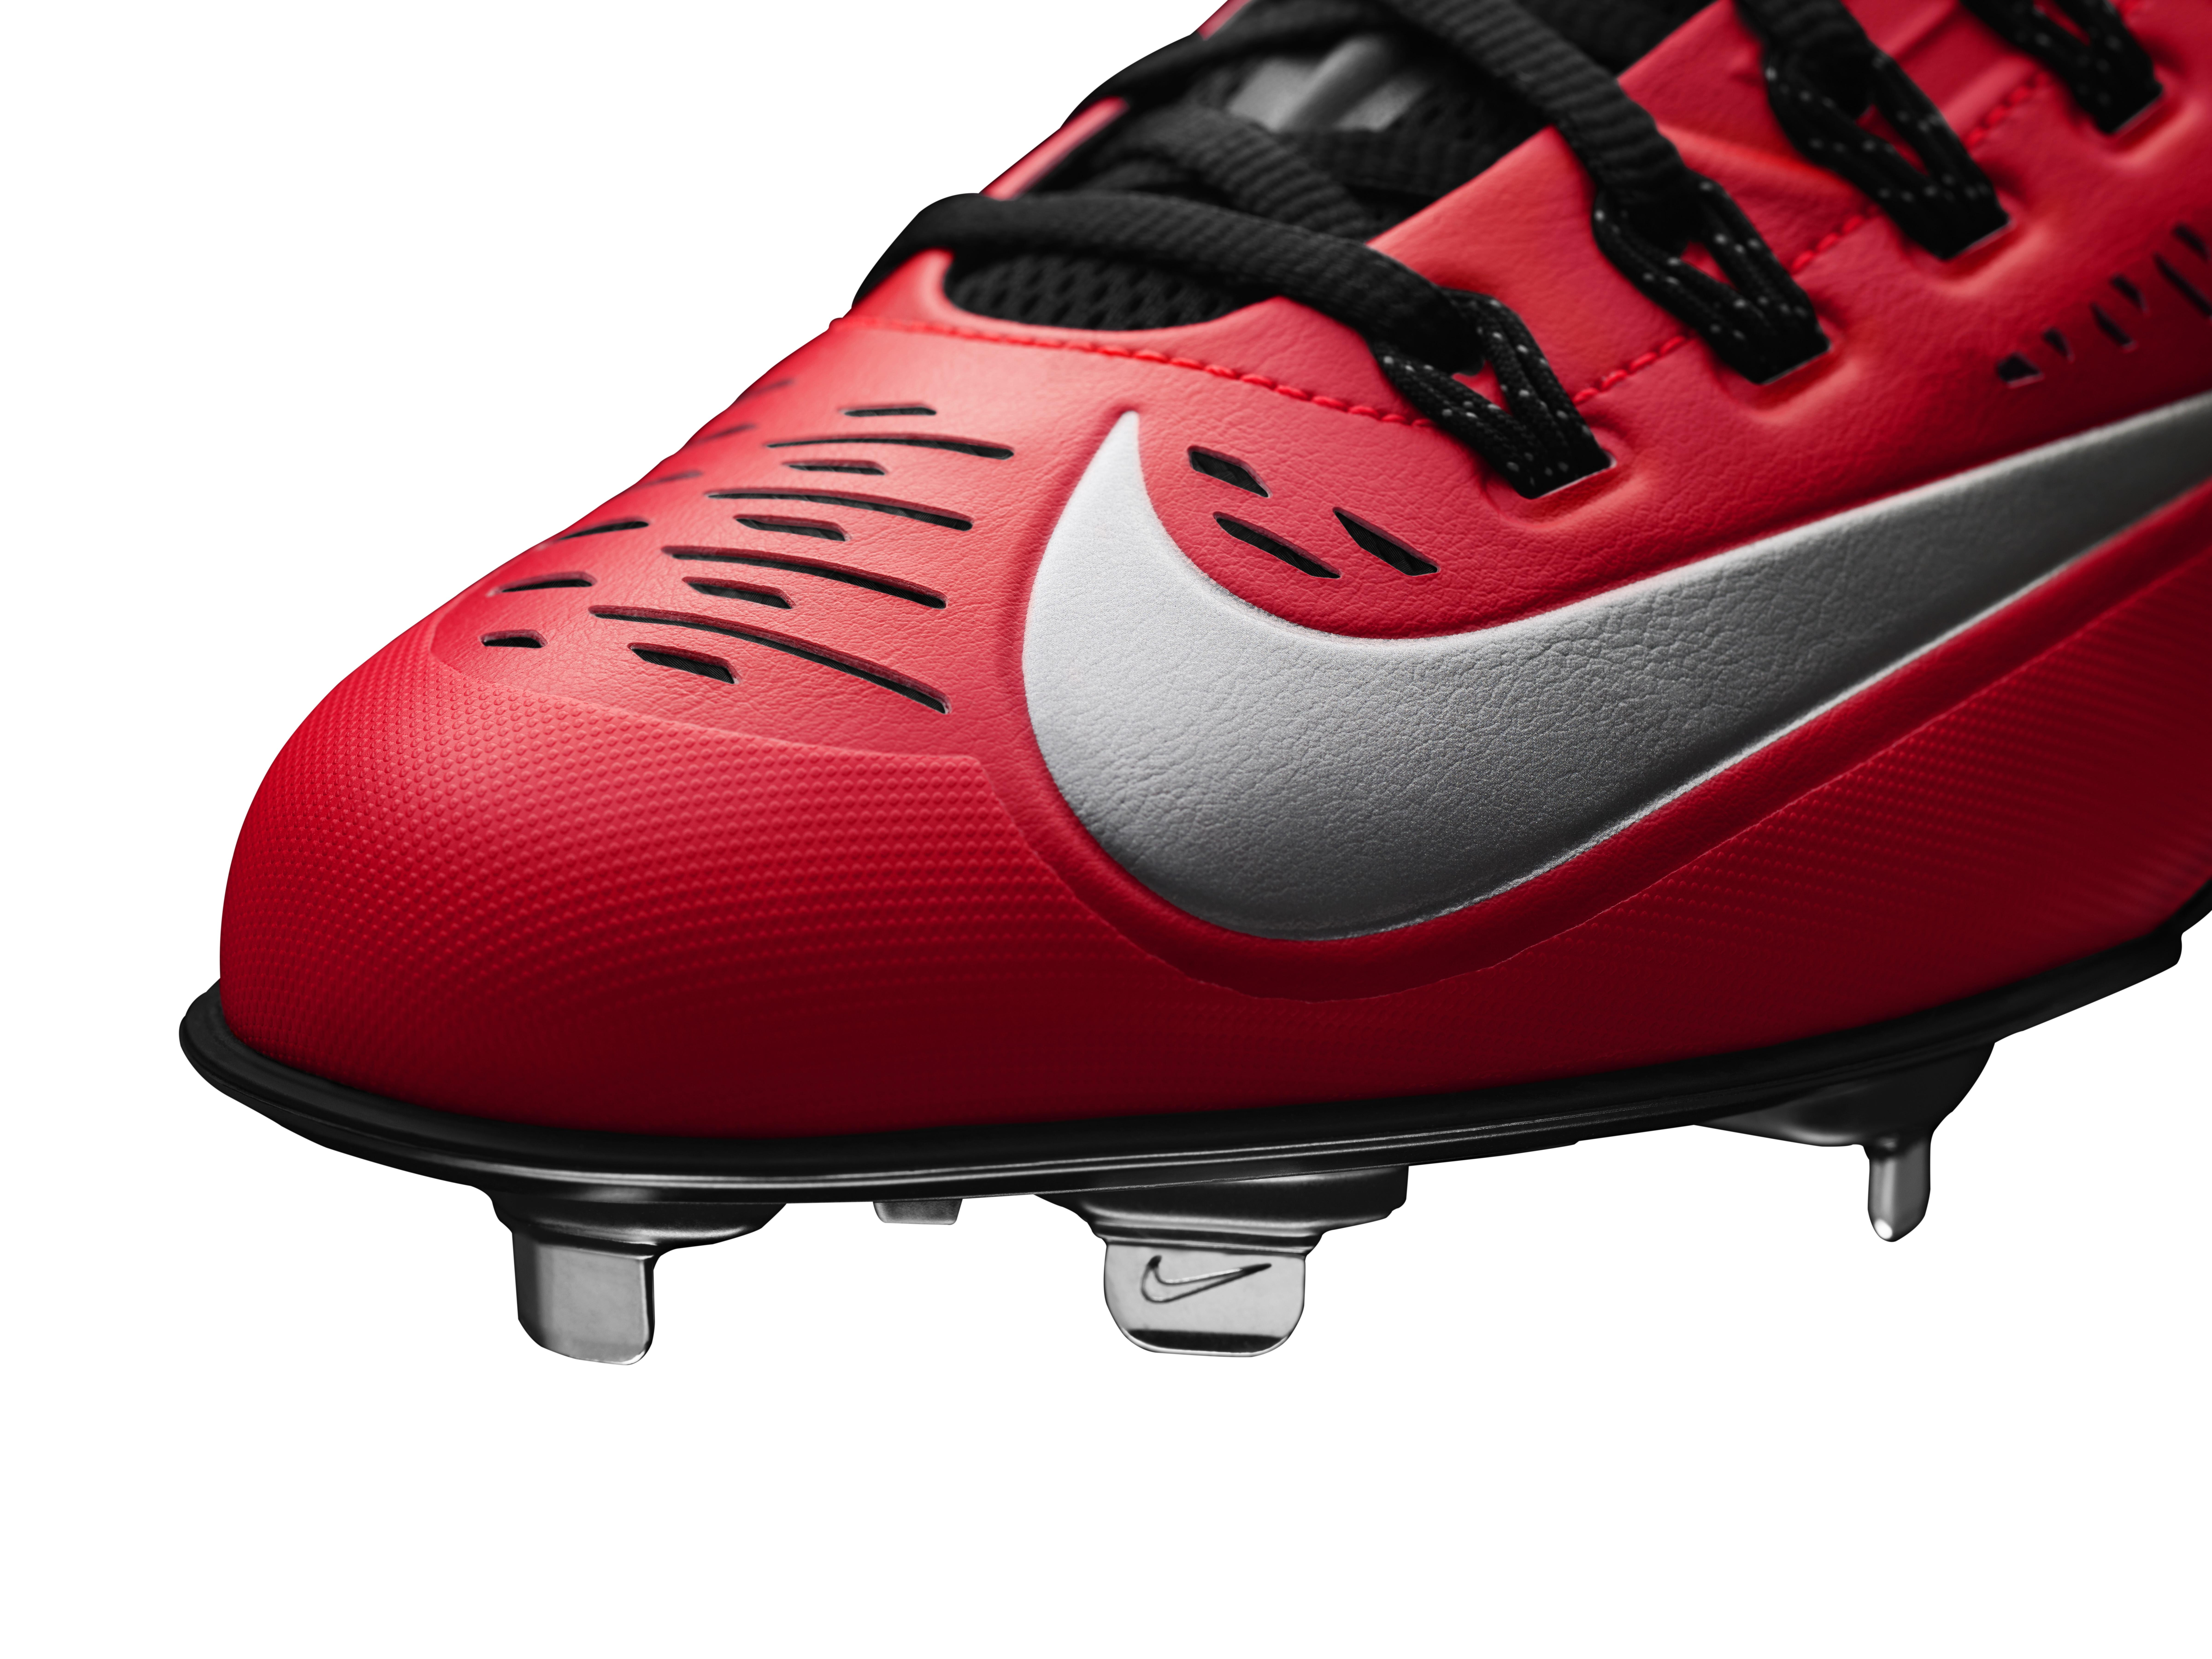 Nike Zoom Vapor Elite J Baseball Cleat Promotes Speed. Download Image: LO �  HI